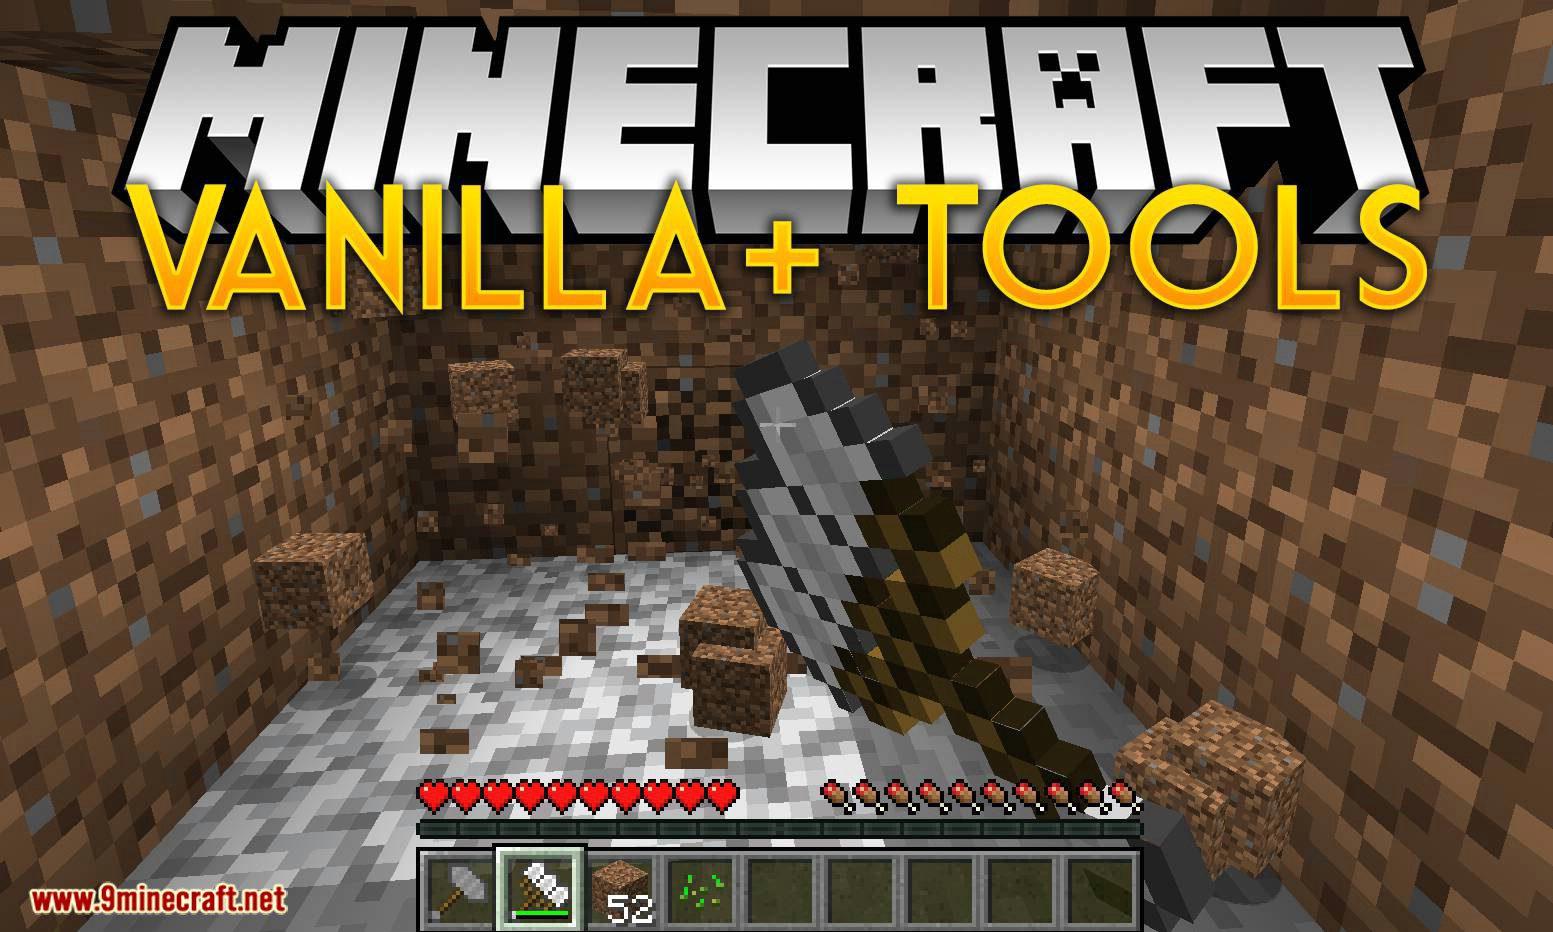 Vanilla Plus Tools Mod for minecraft logo